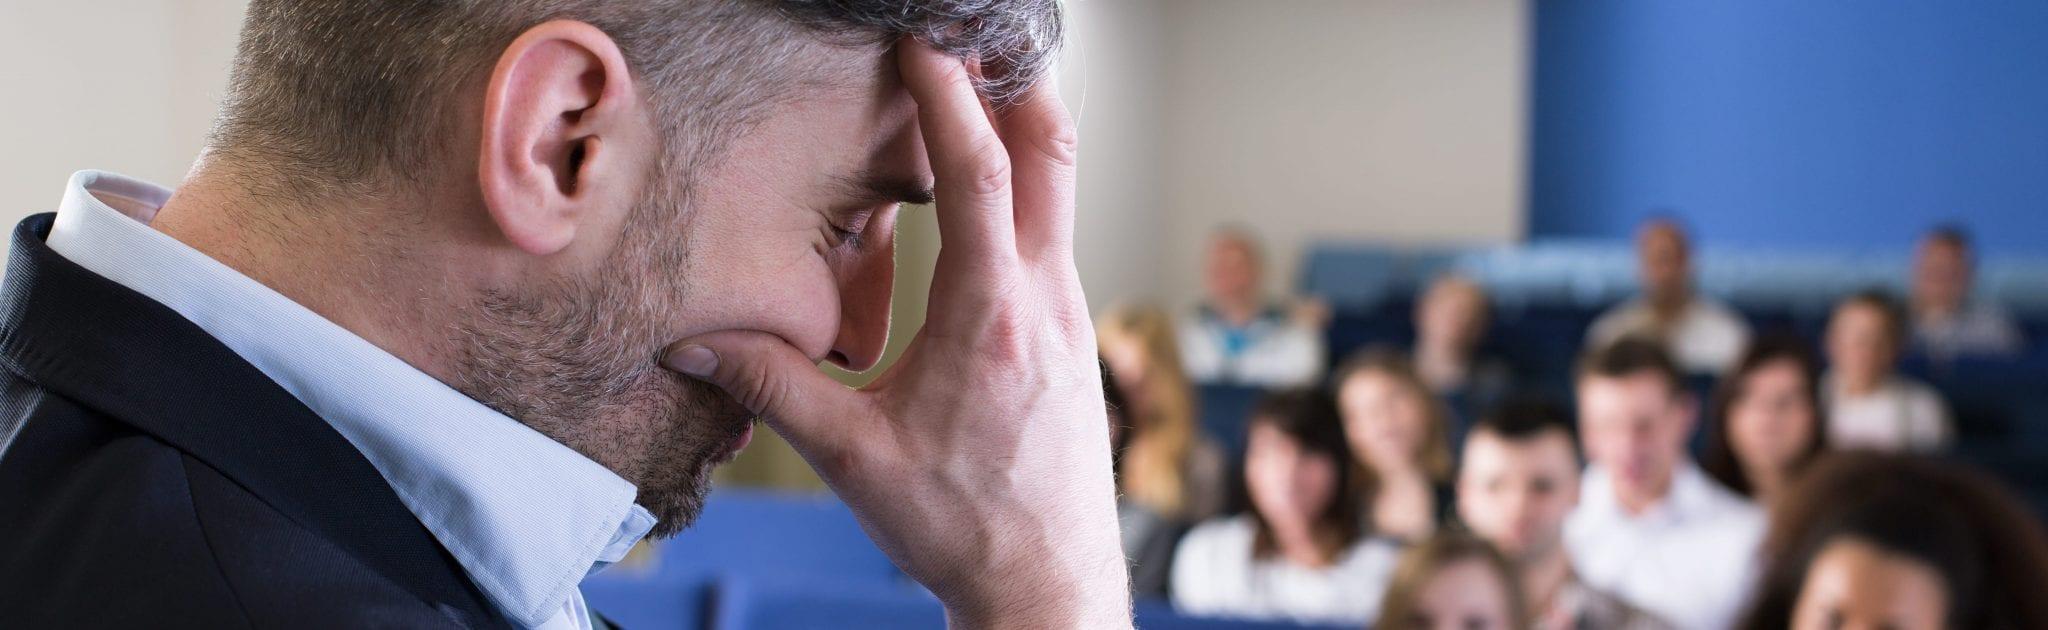 AdobeStock 105529141 - Reasons to Become a School Principal